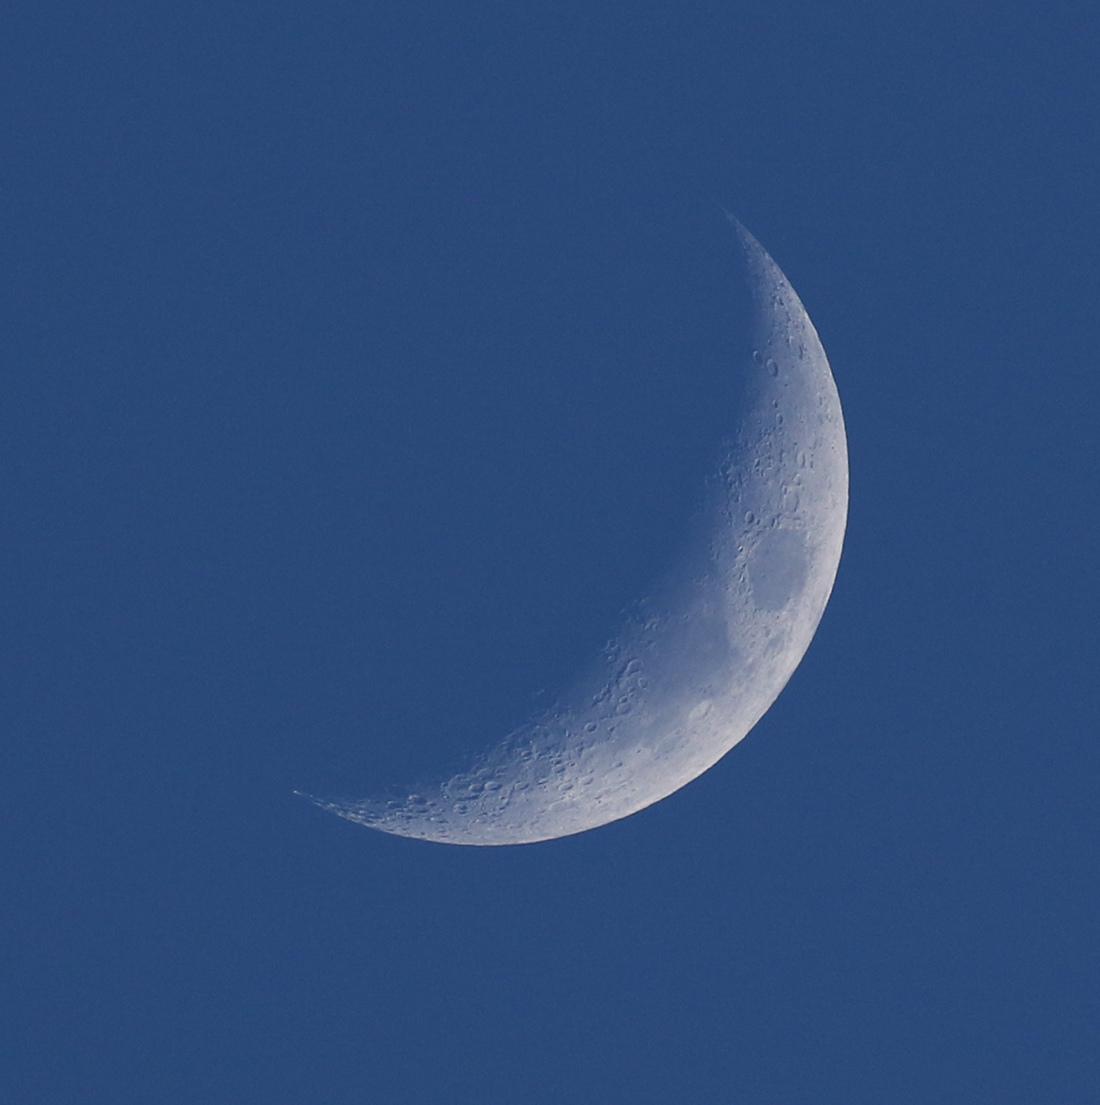 la lune, au soir du 19/05/2018 (43127/34/41.JPG)